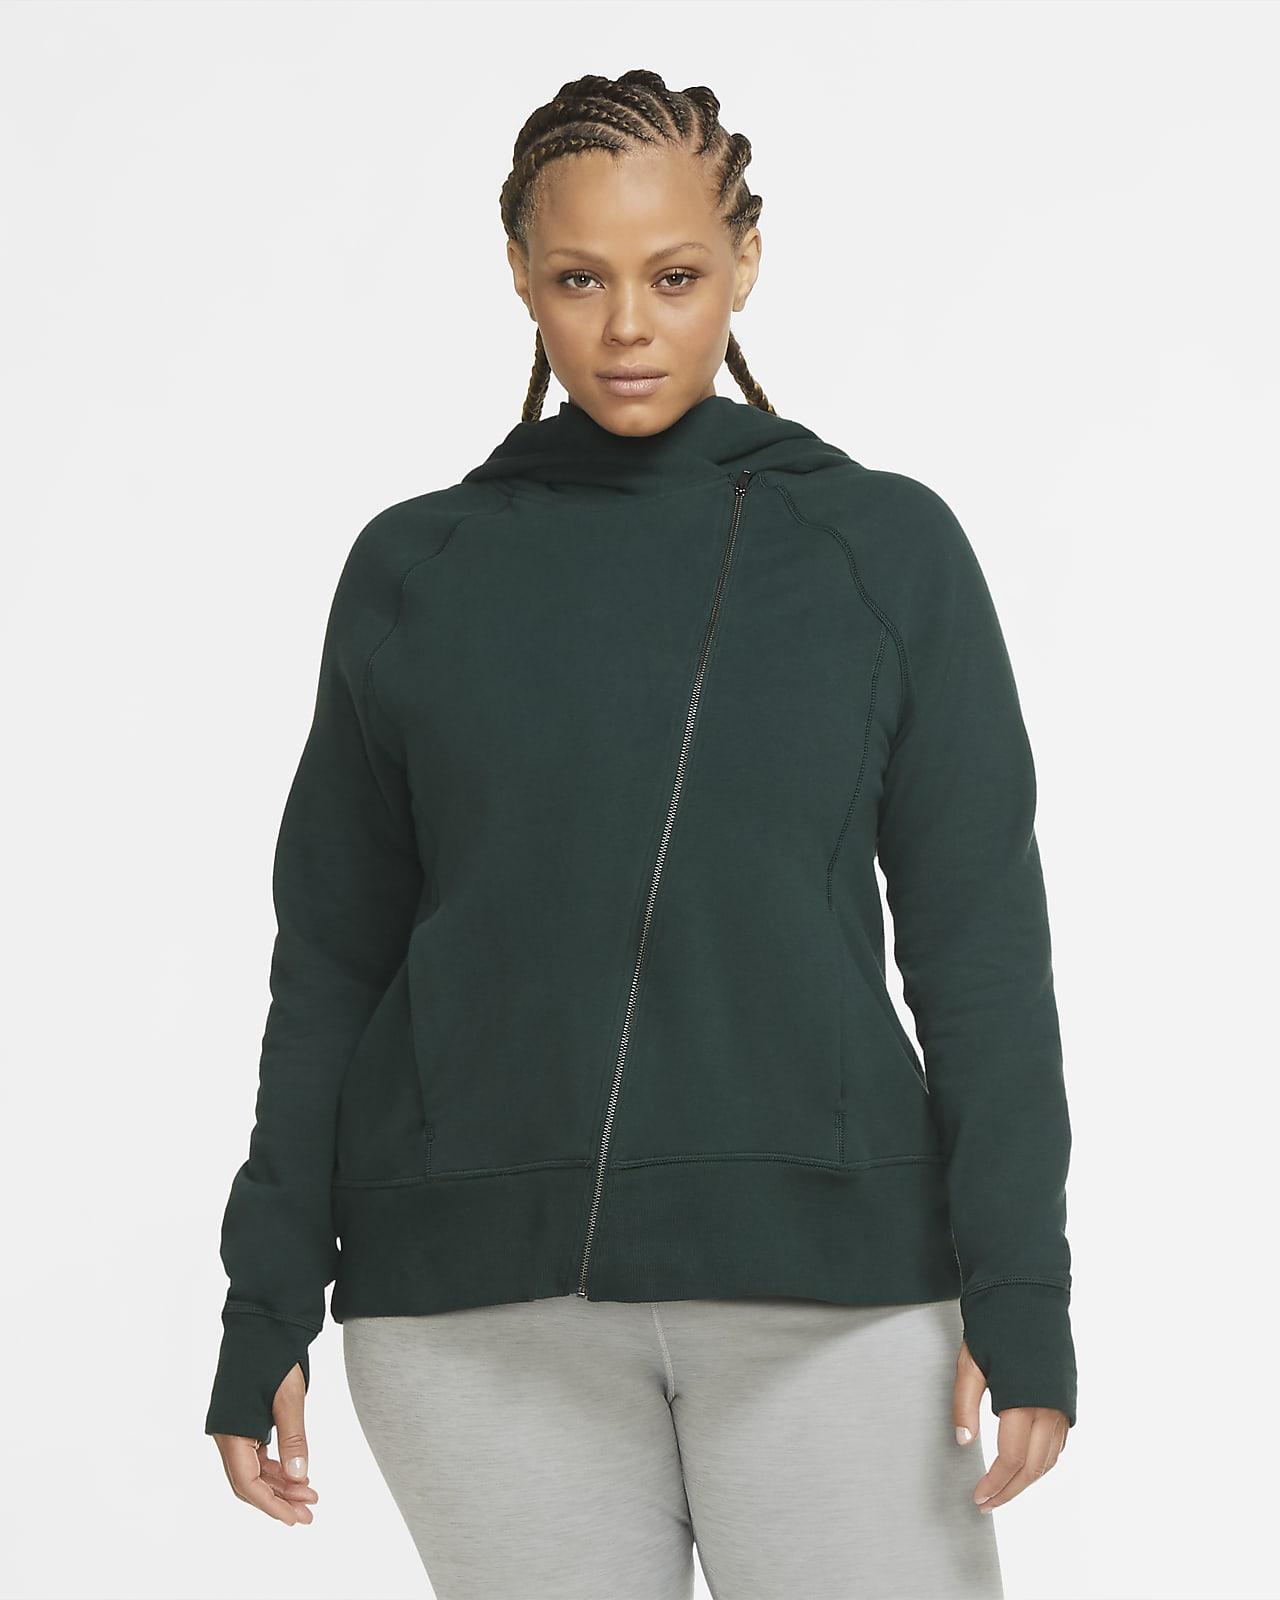 Nike Yoga Women's Full-Zip Hoodie (Plus Size)